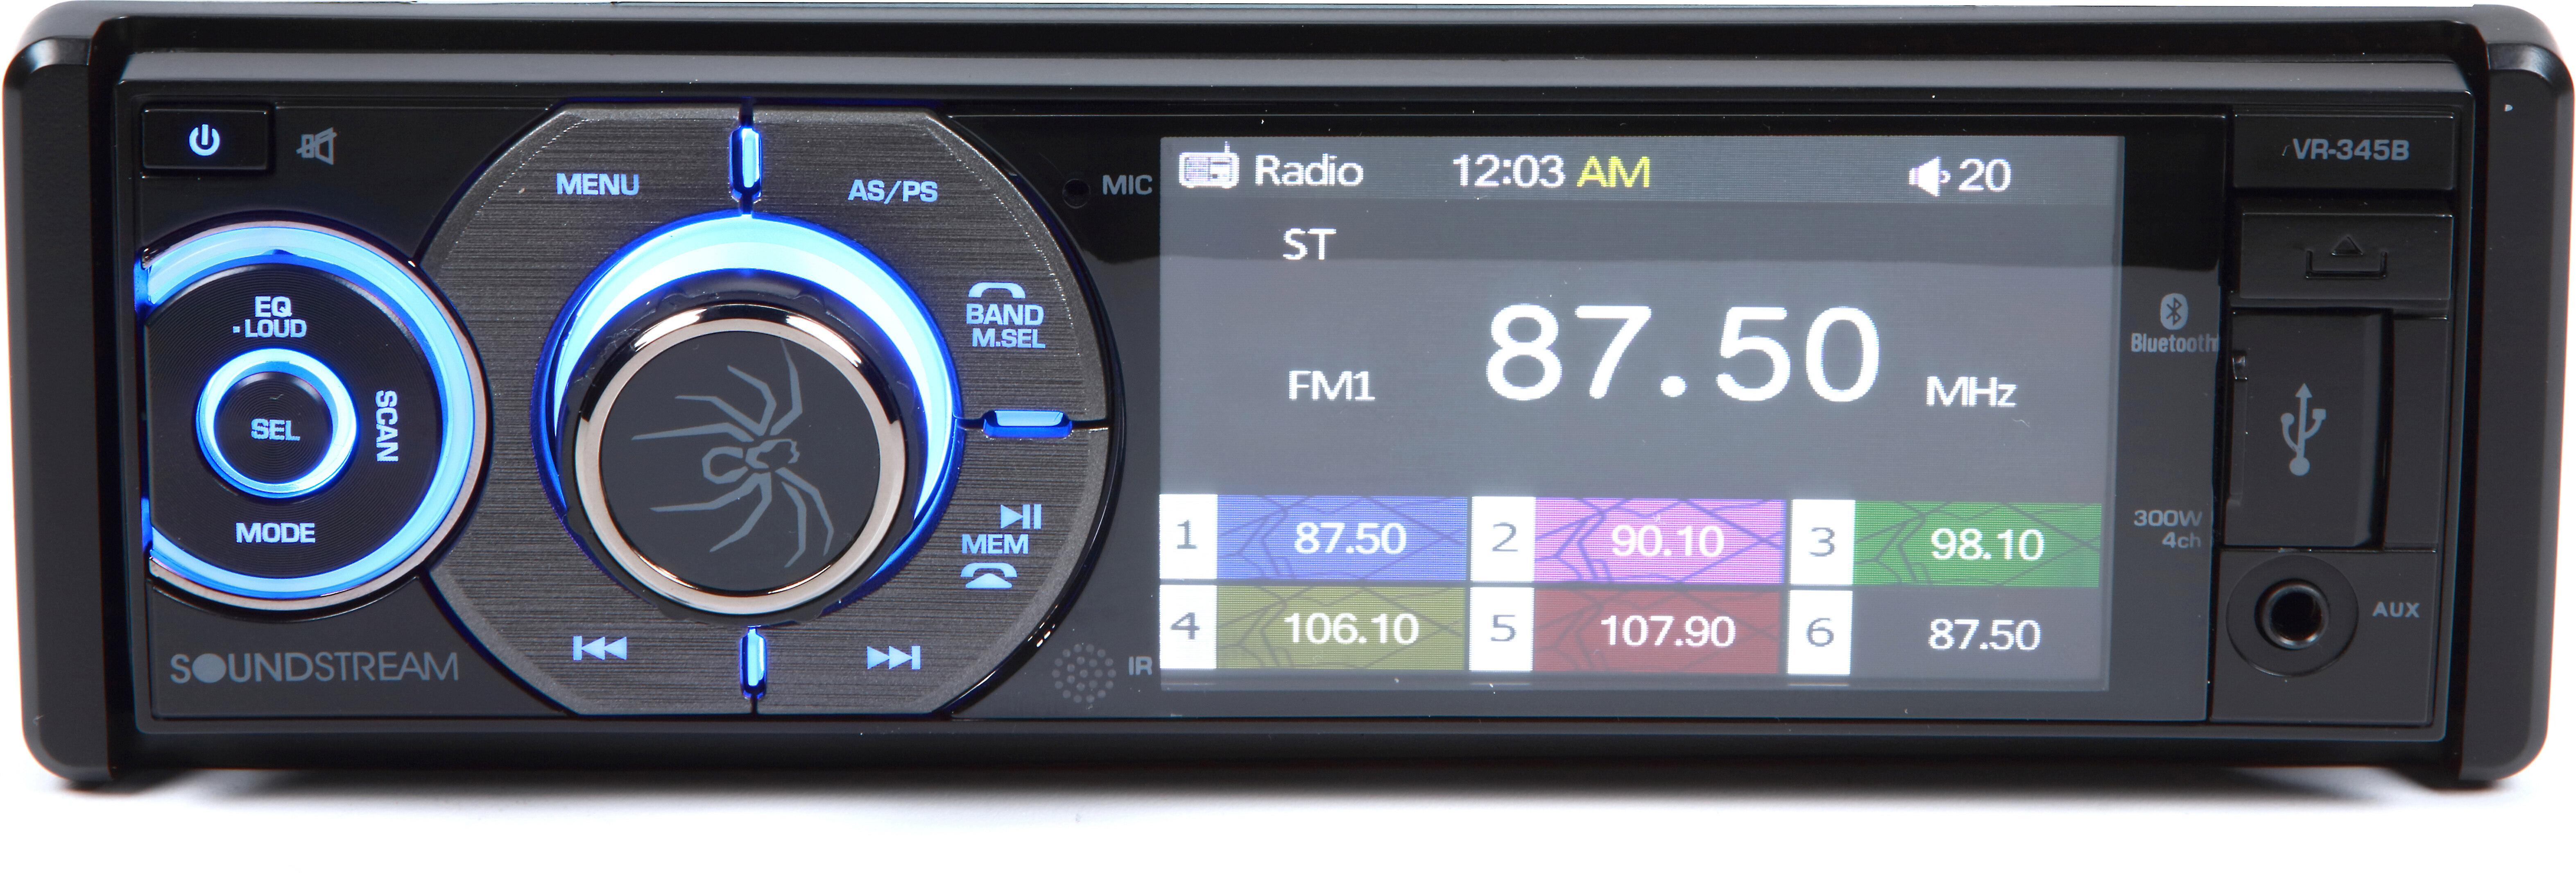 NEW SOUNDSTREAM BLUETOOTH CAR STEREO RADIO W// USB//AUX INPUTS W// INSTALLATION KIT